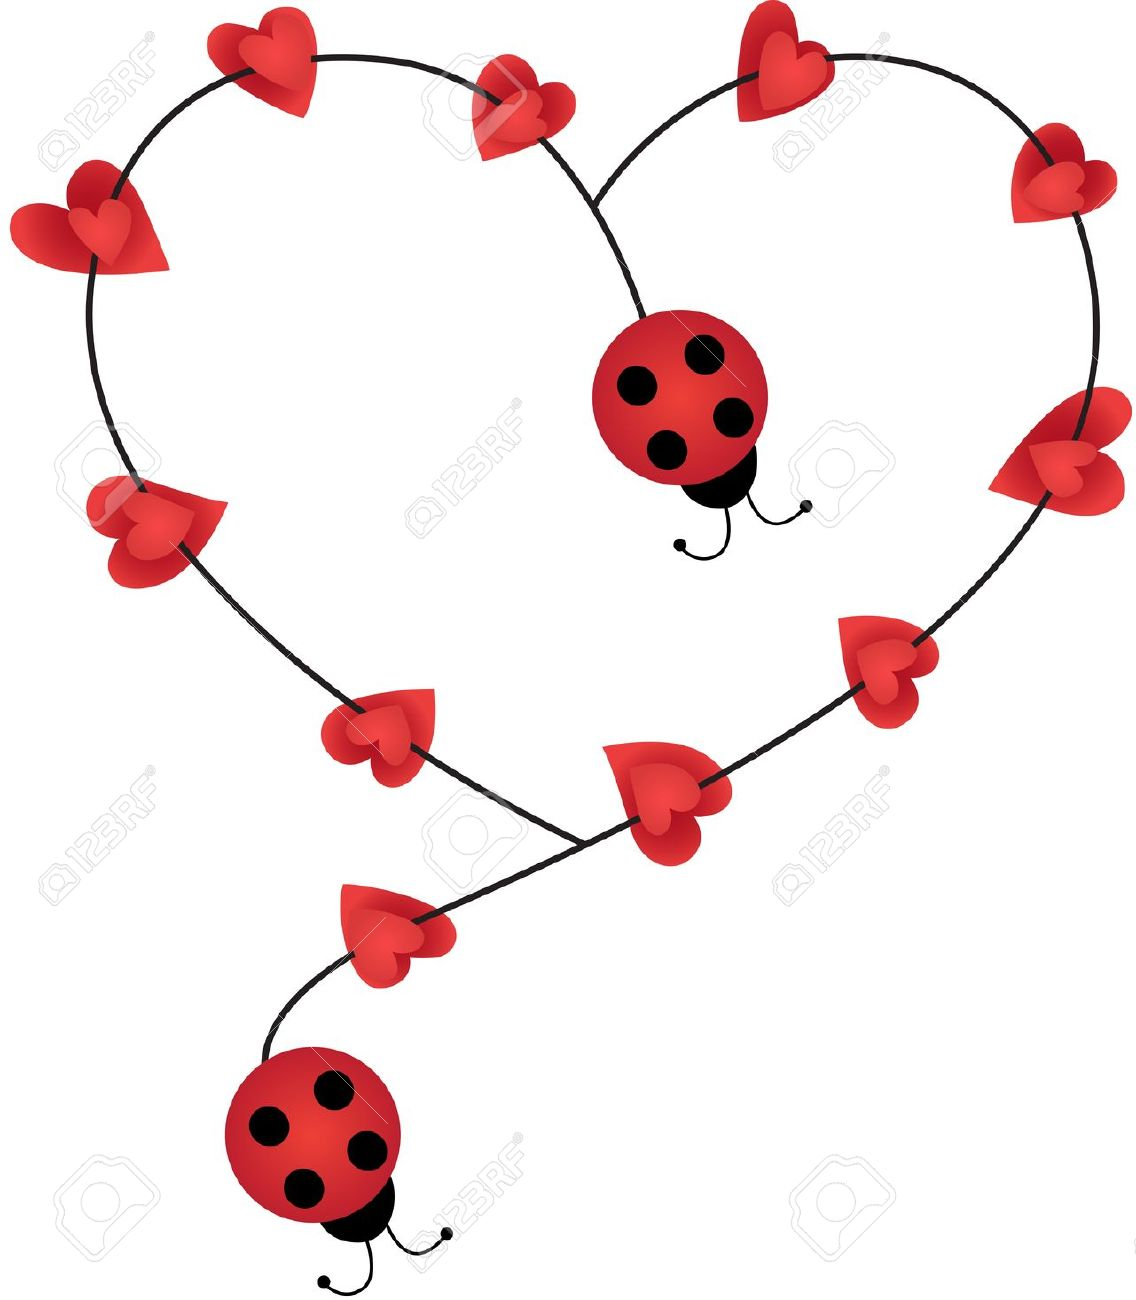 - Ladybug Clipart Heart, Ladybug Heart Transparent FREE For Download